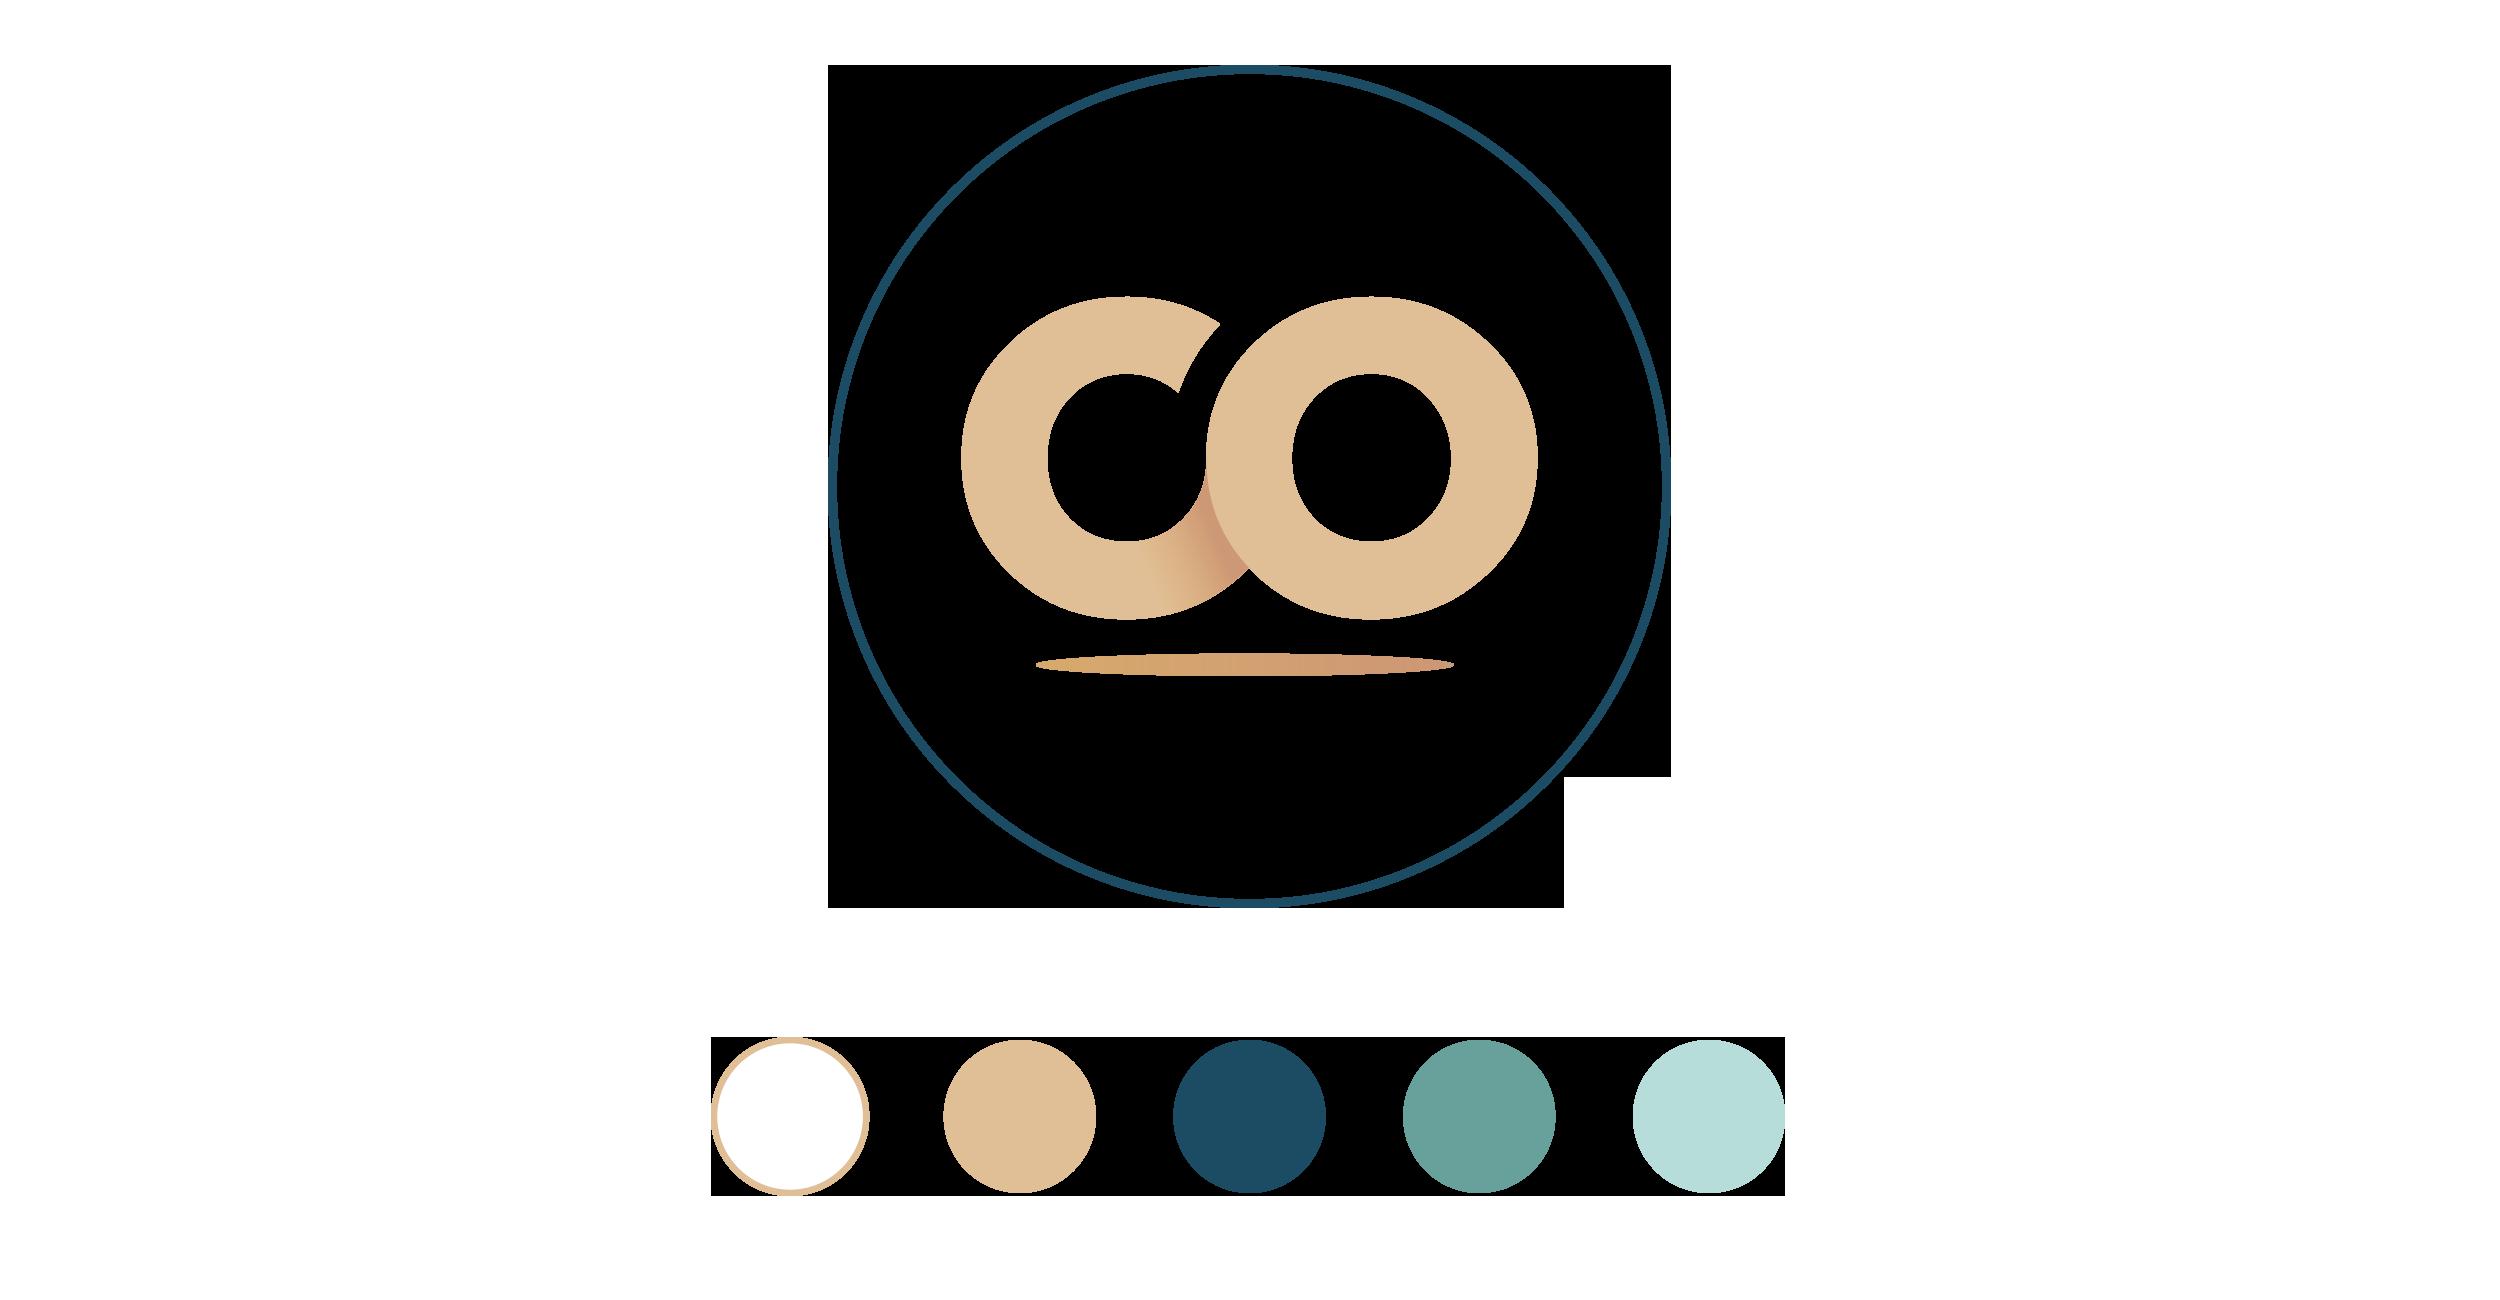 katelynbishop_design_coworkingshop_icon